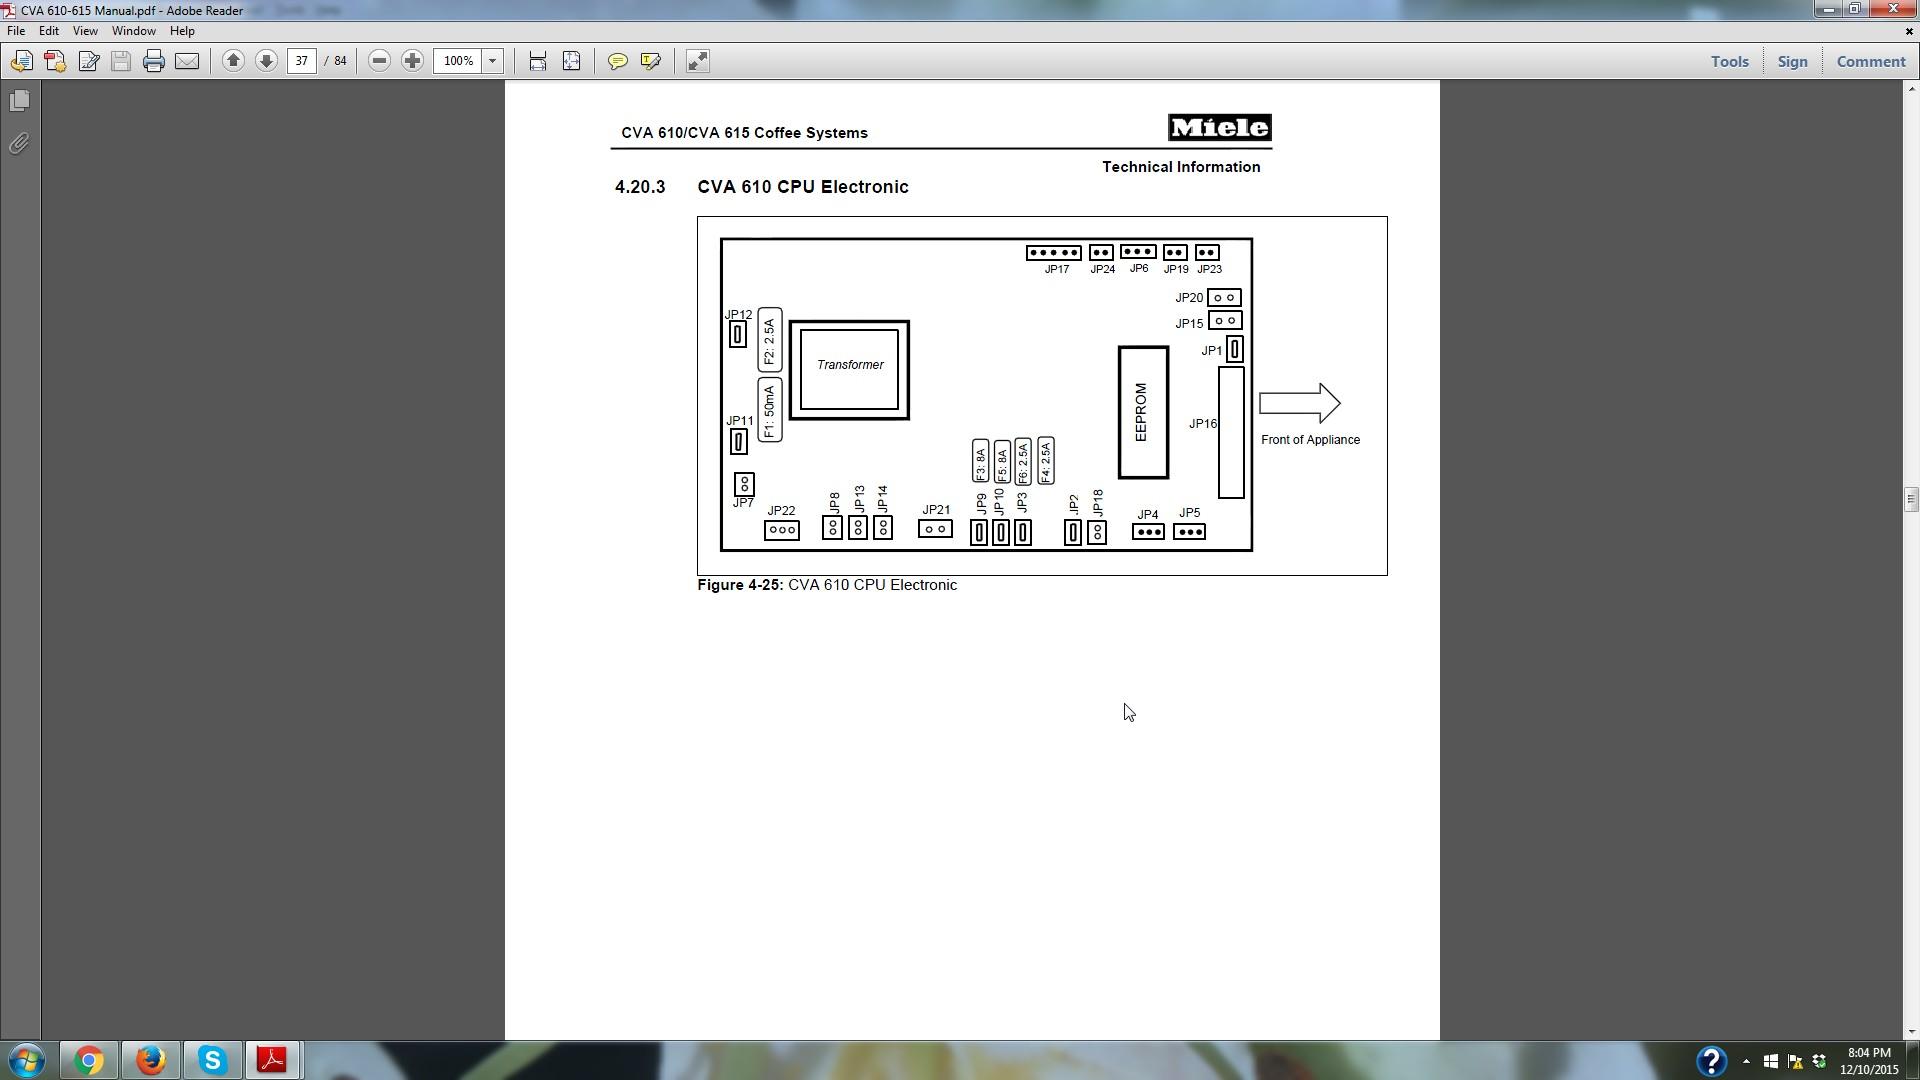 906e8a87-f012-412b-bfbd-24fa0a626524_ScreenHunter_1527 Dec. 10 20.04.jpg